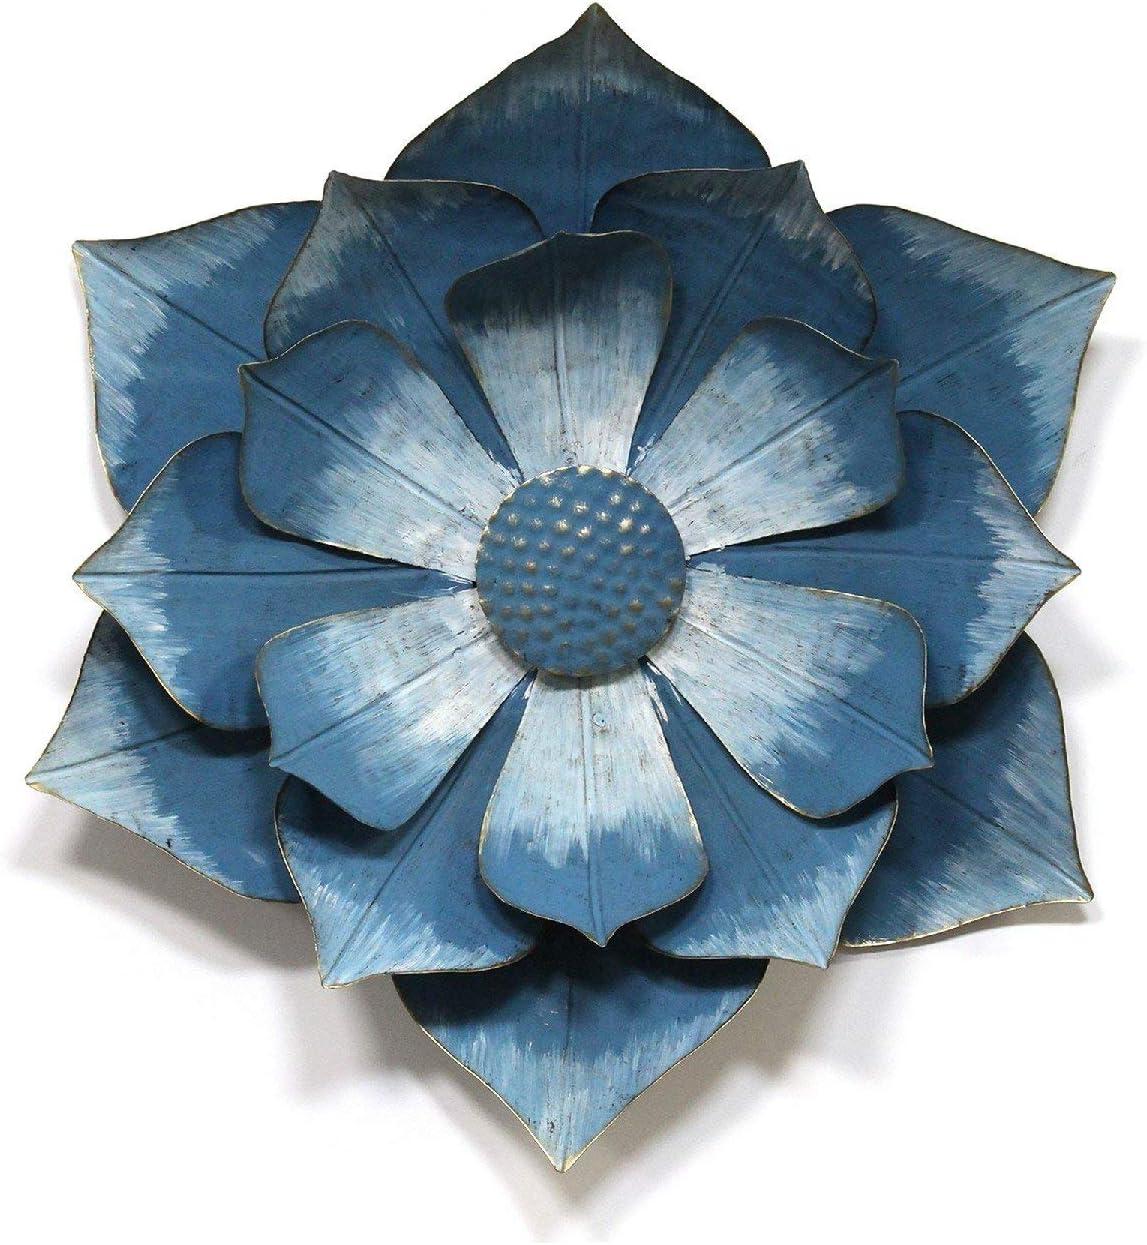 "Stratton Home Décor Stratton Home Decor Blue Ipomoea Metal Flower, 17.32"" W X 4.33"" D X 19.69"" H"